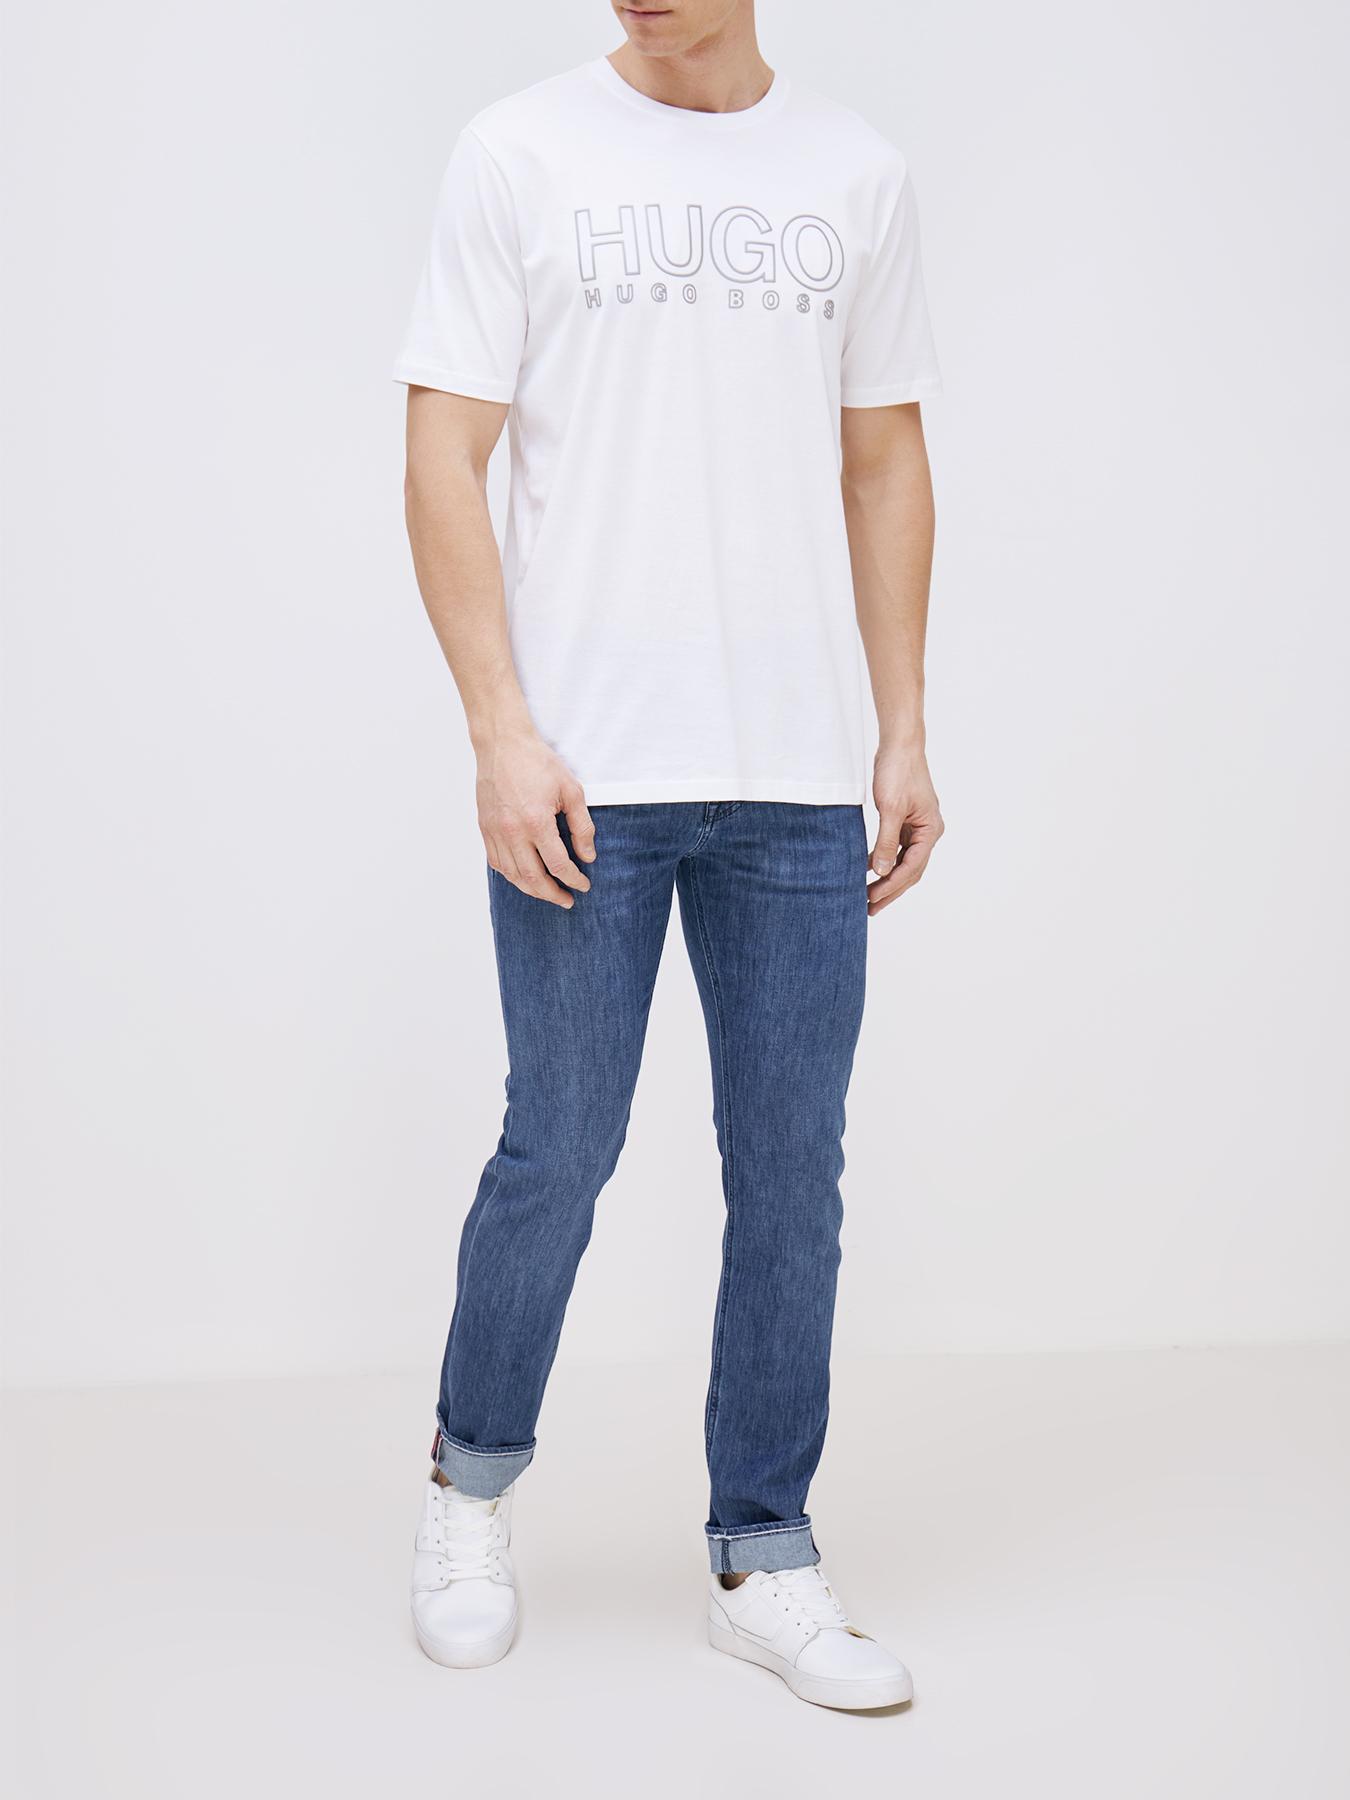 Фуфайка (футболка) HUGO Футболка Dolive фуфайка футболка hugo футболка drosal